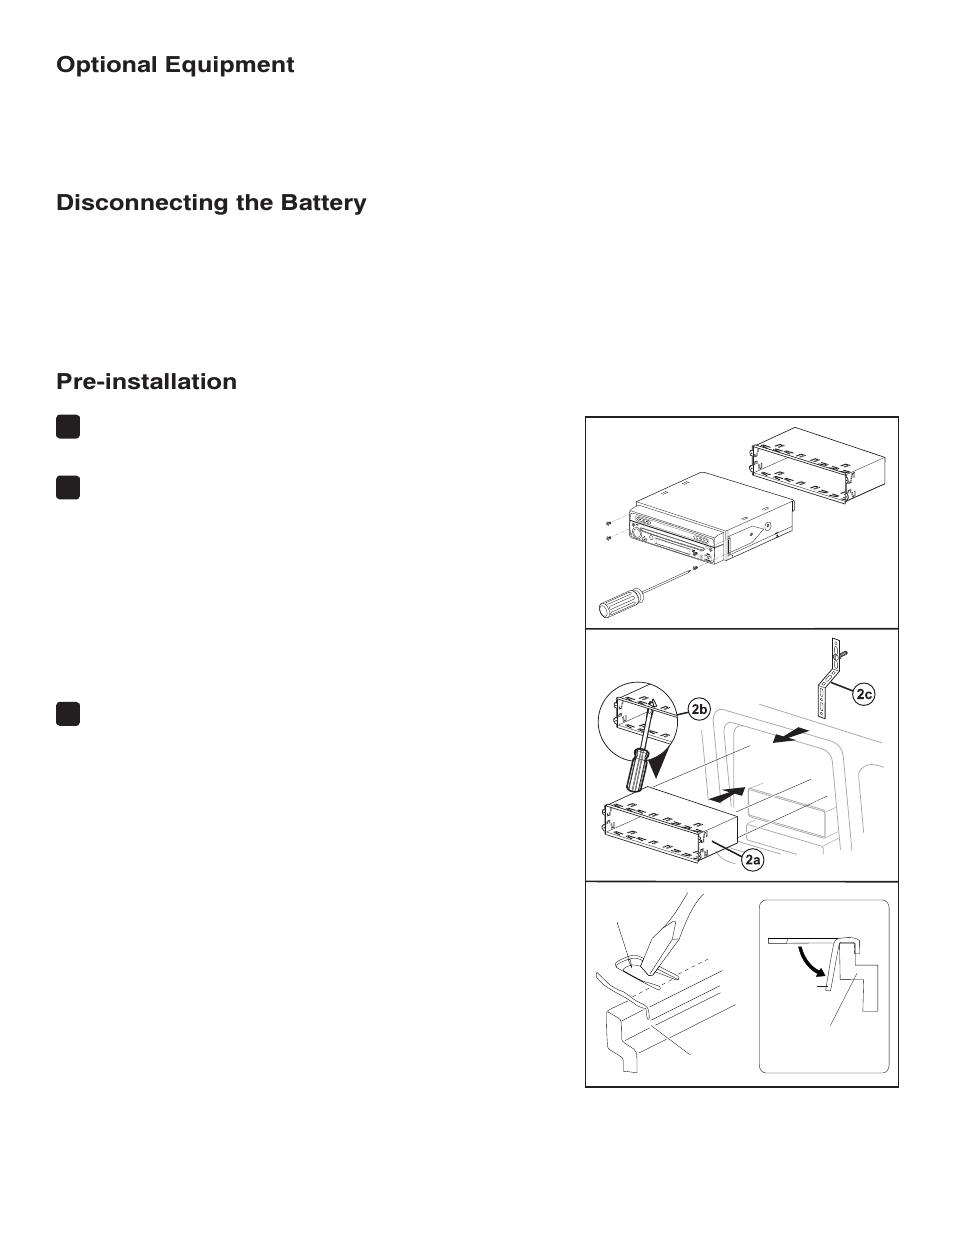 Optional equipment, Disconnecting the battery, Pre-installation | Jensen  VM9214 User Manual |